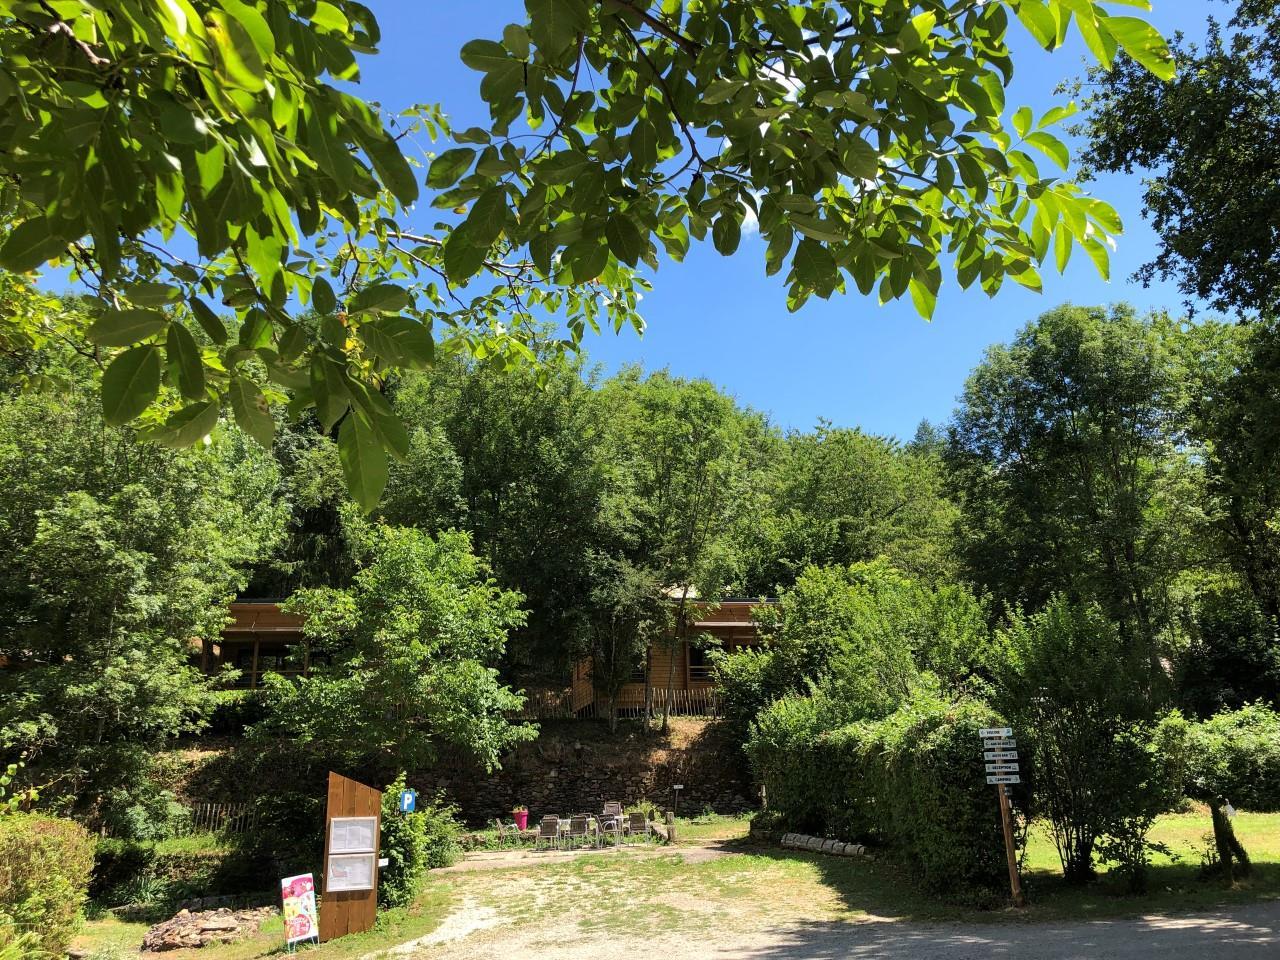 Camping Moulin de Chaules, Saint-Constant, Cantal